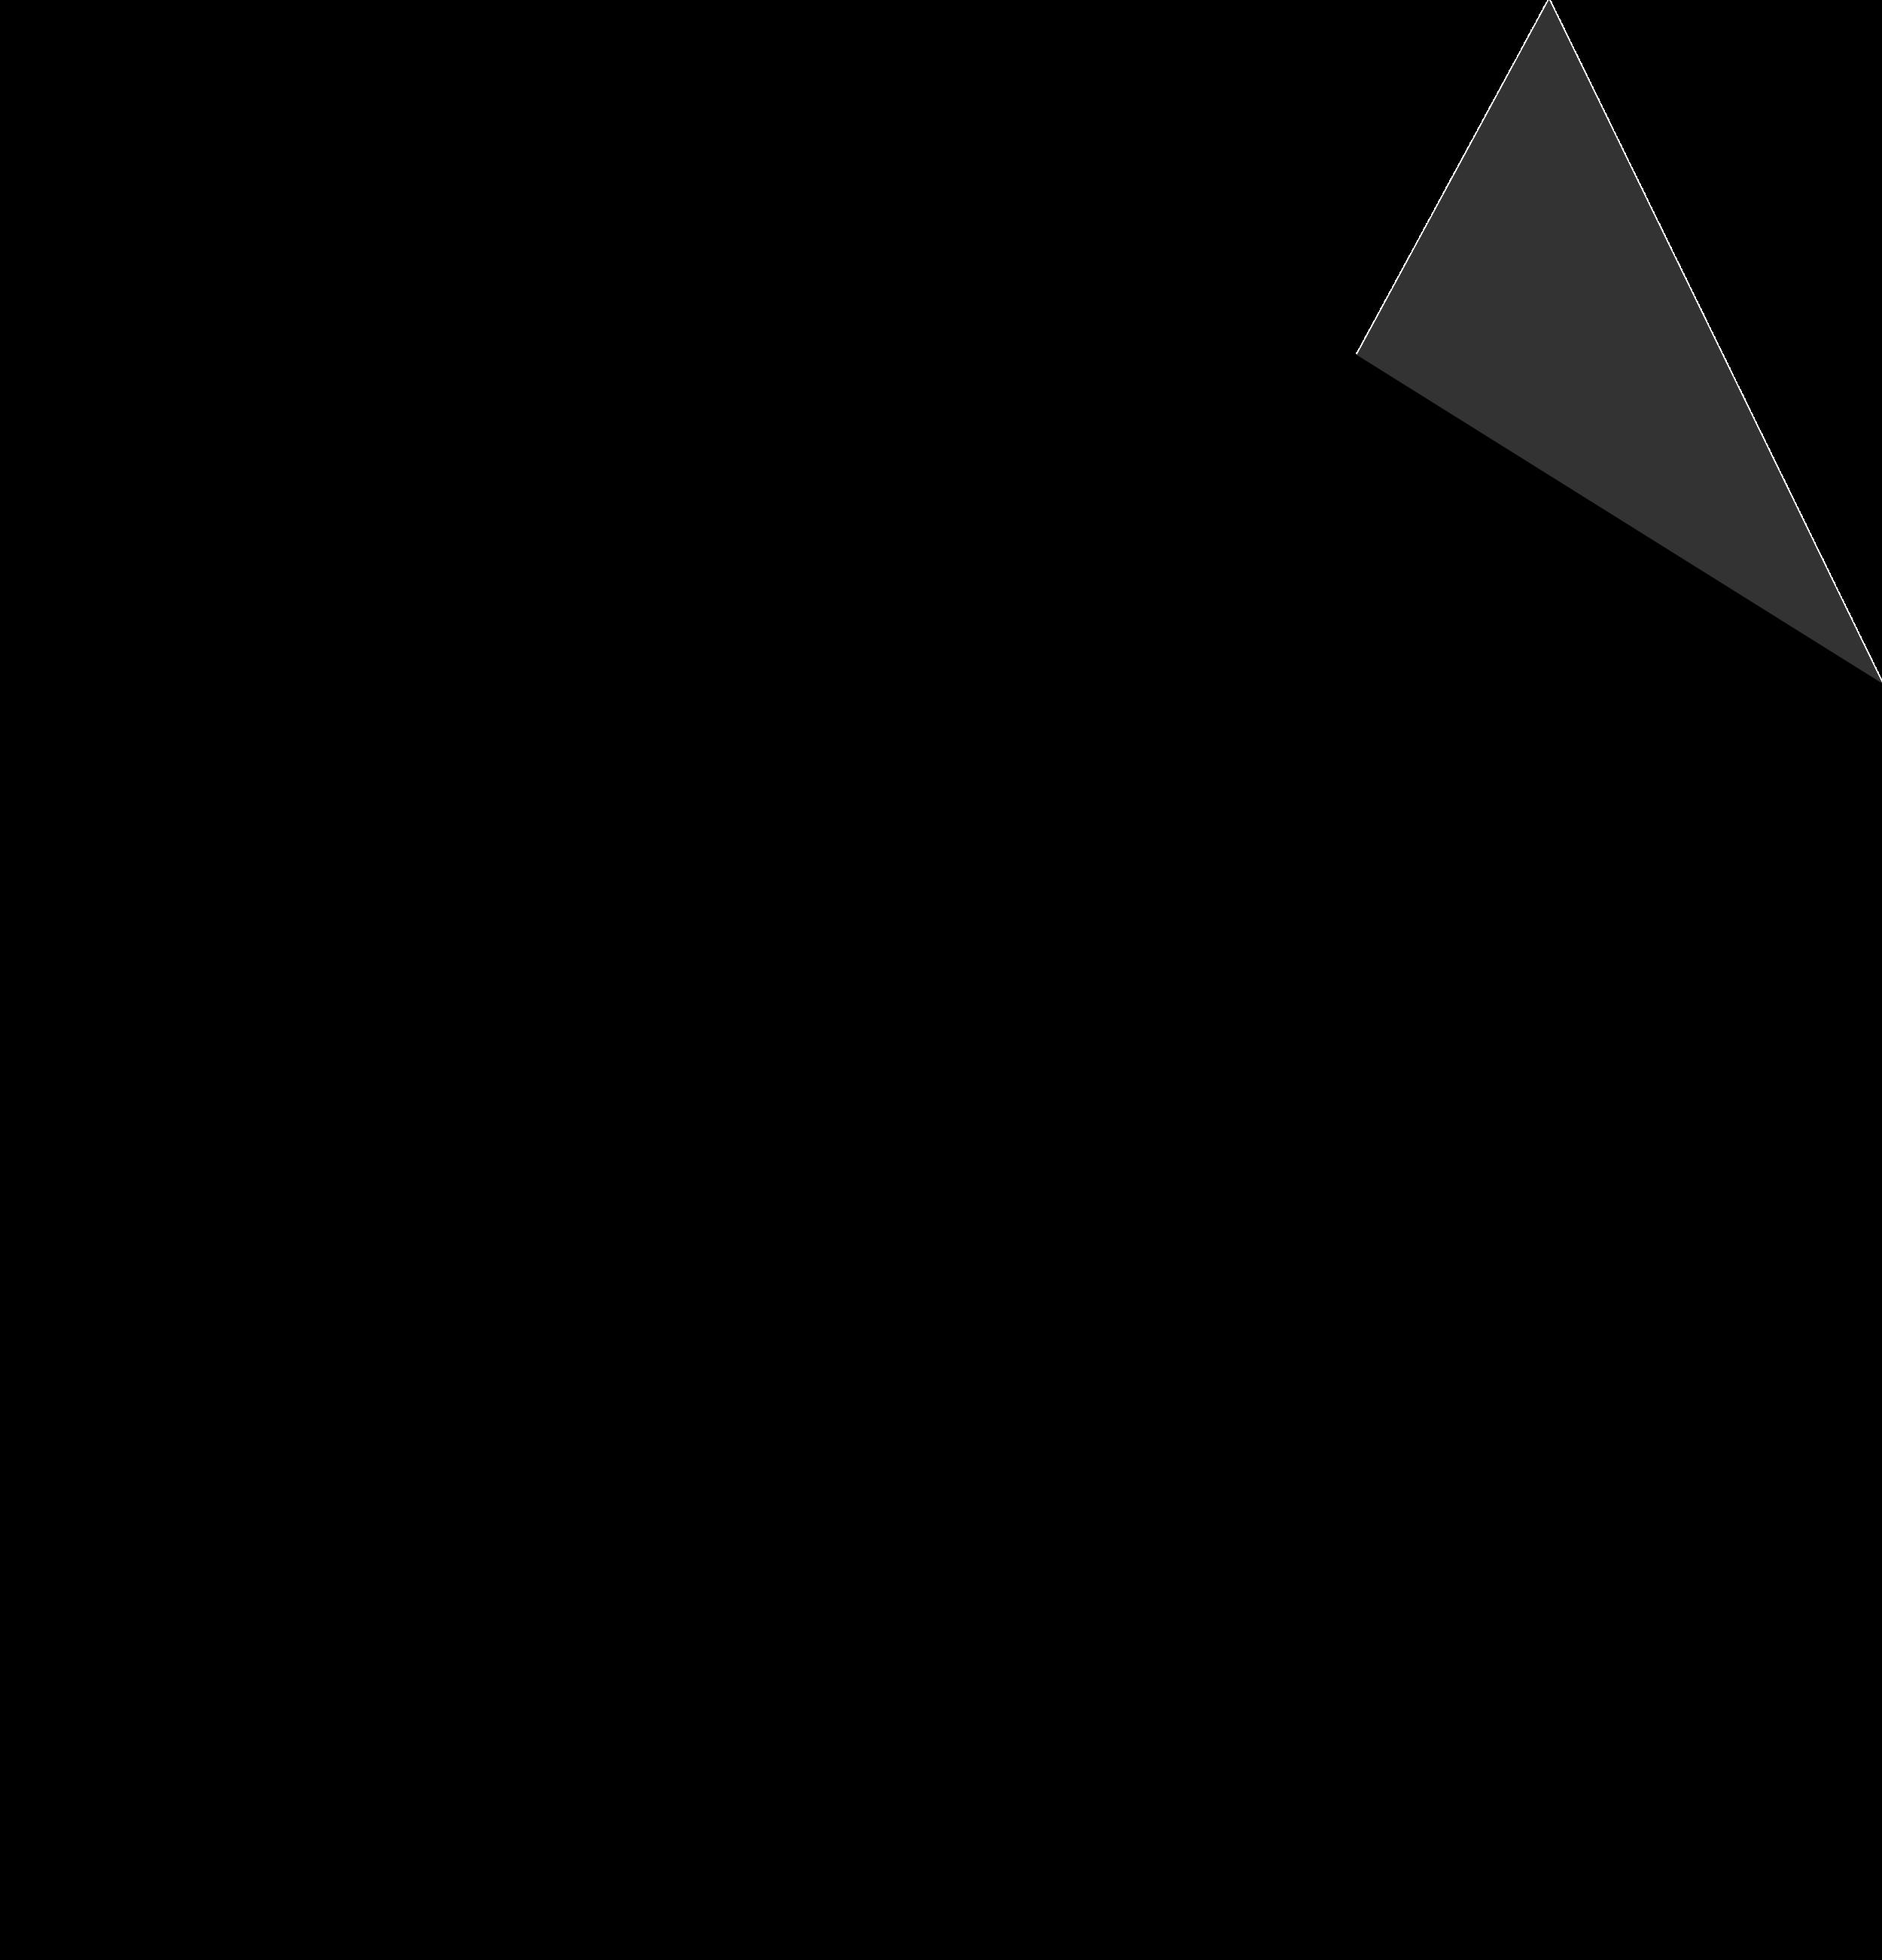 Brand_SouthAust1_RGB_Black.png